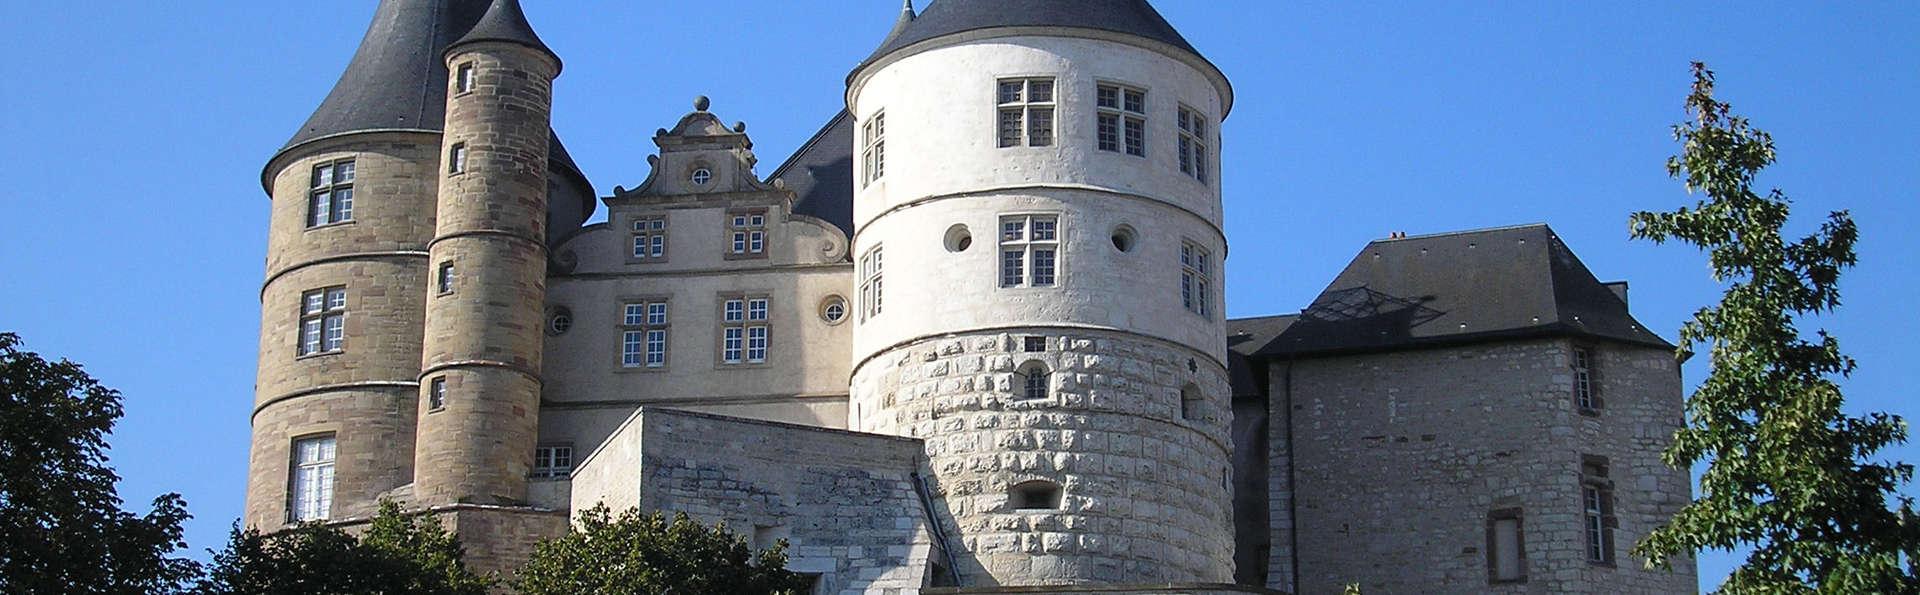 Hôtel Bristol - Montbéliard - EDIT_destination.jpg